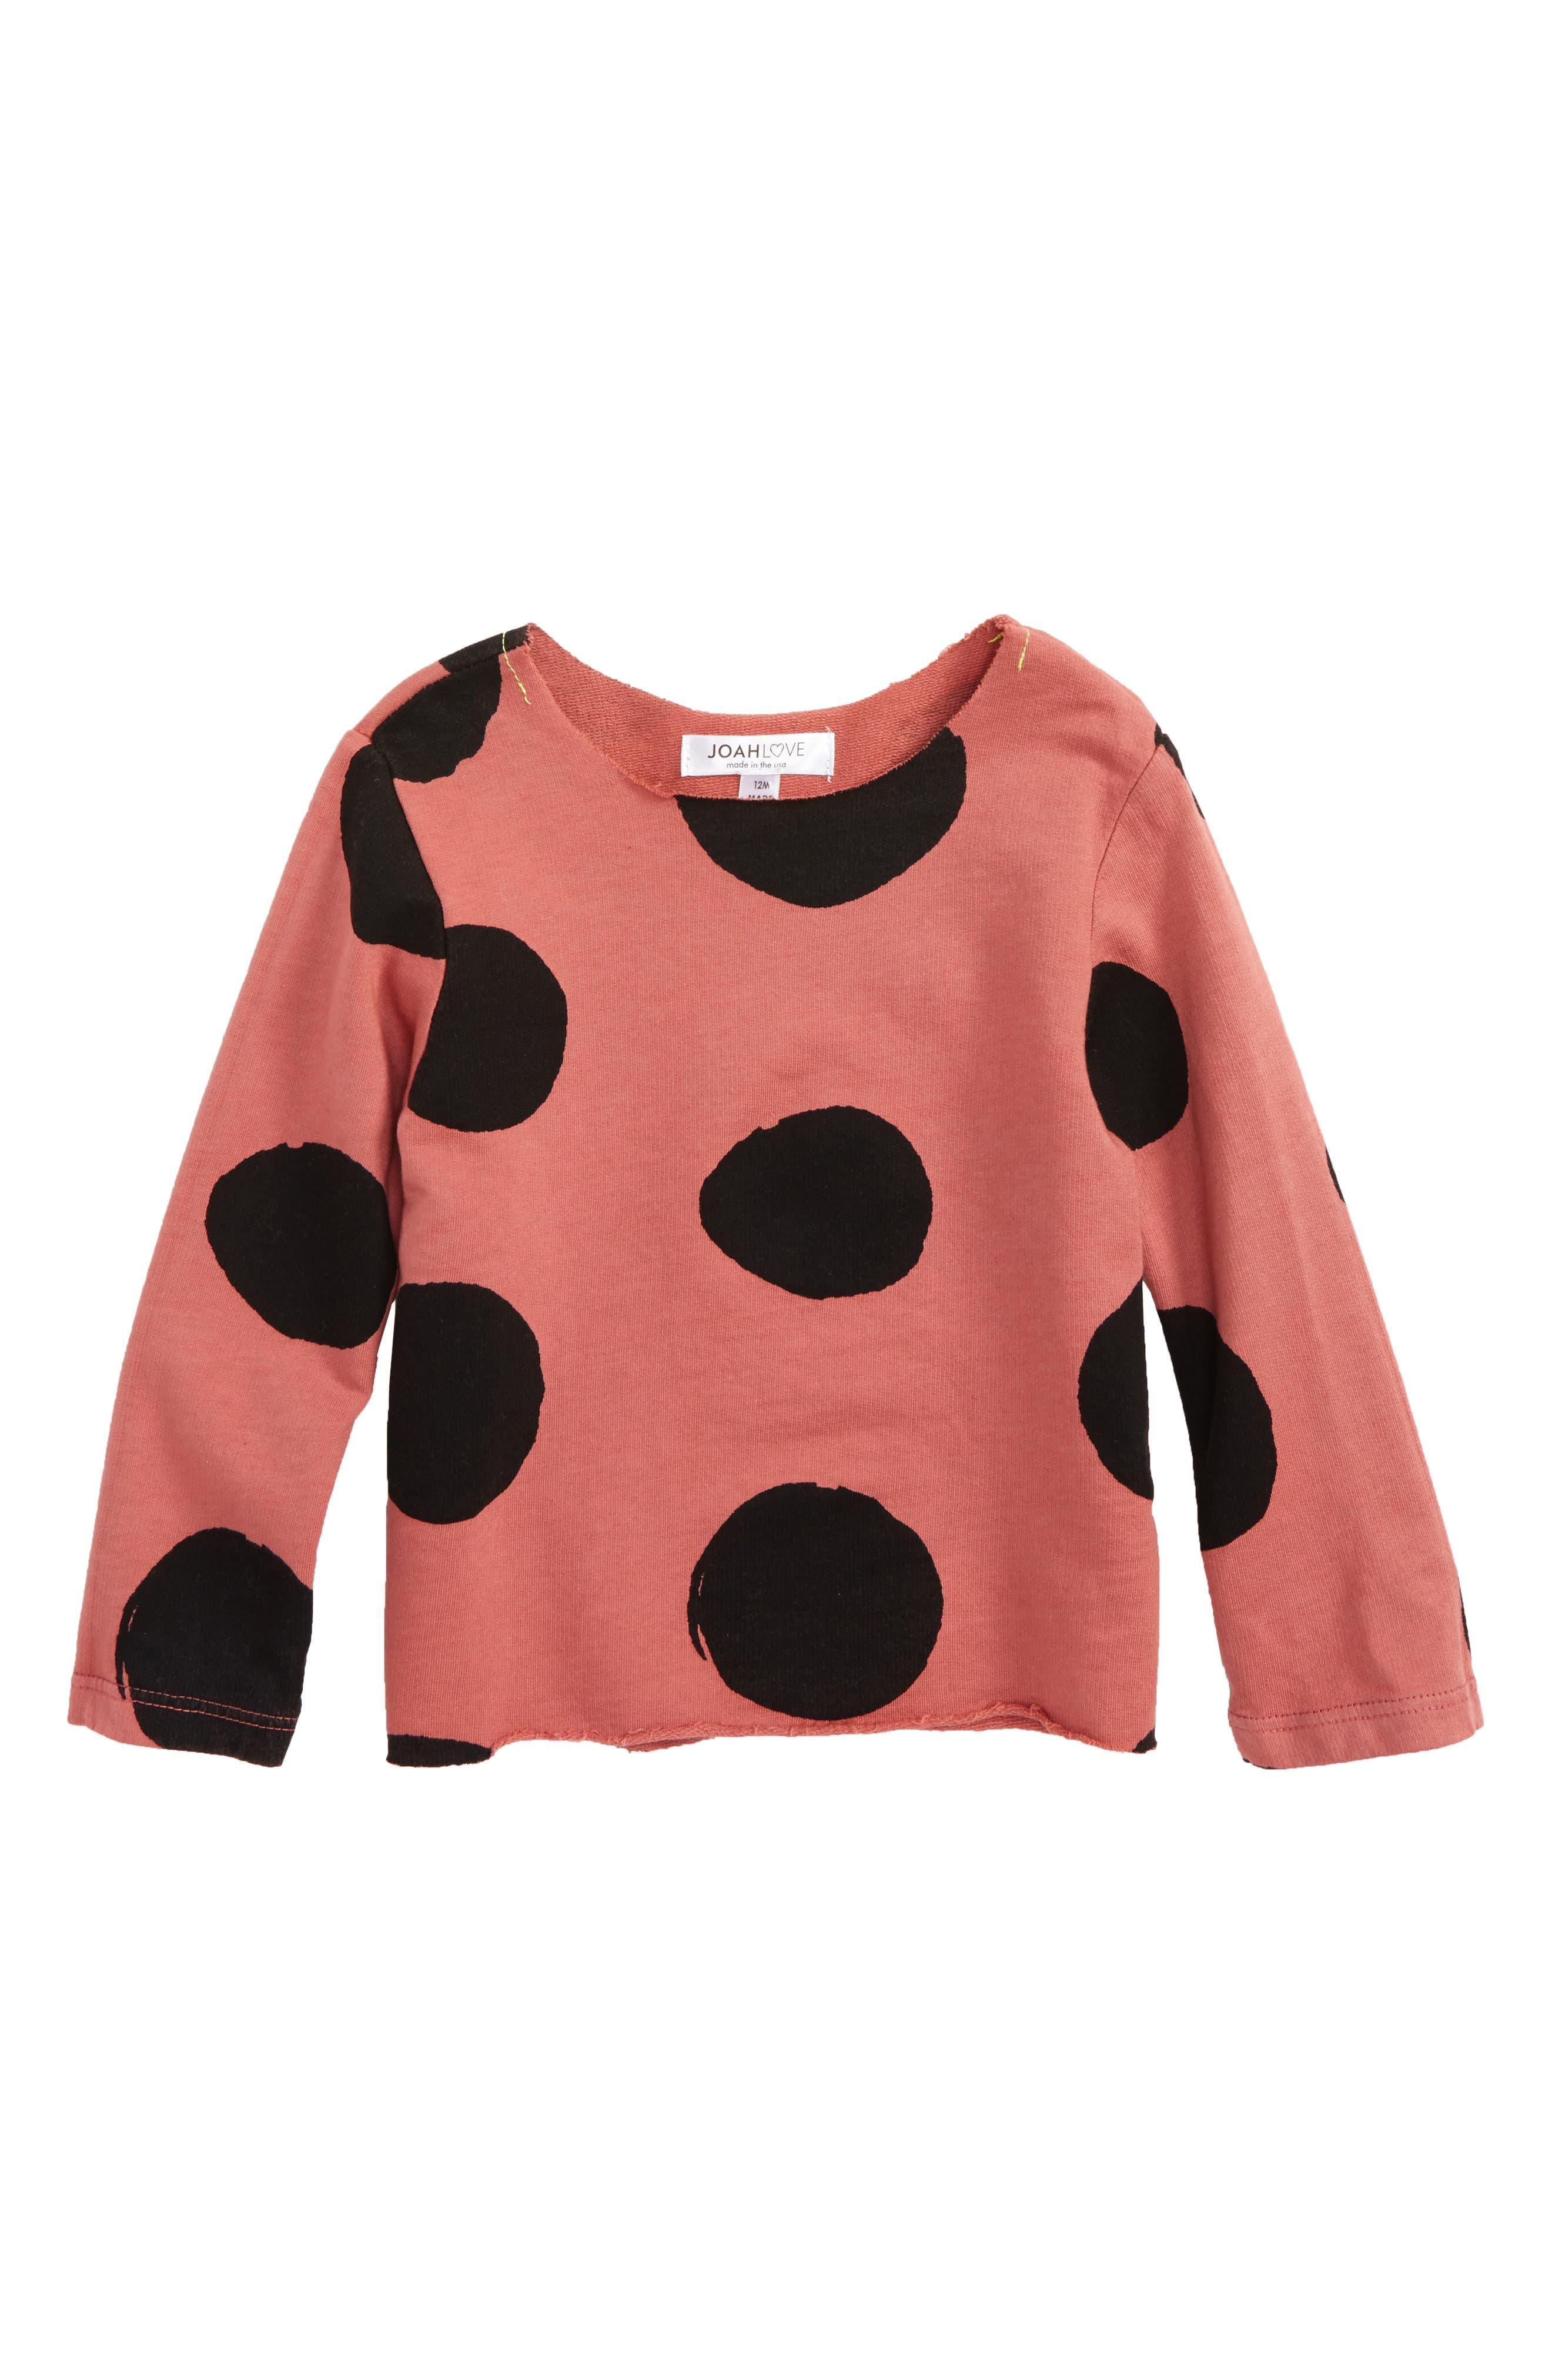 Main Image - Joah Love Dot Sweatshirt (Baby Girls)